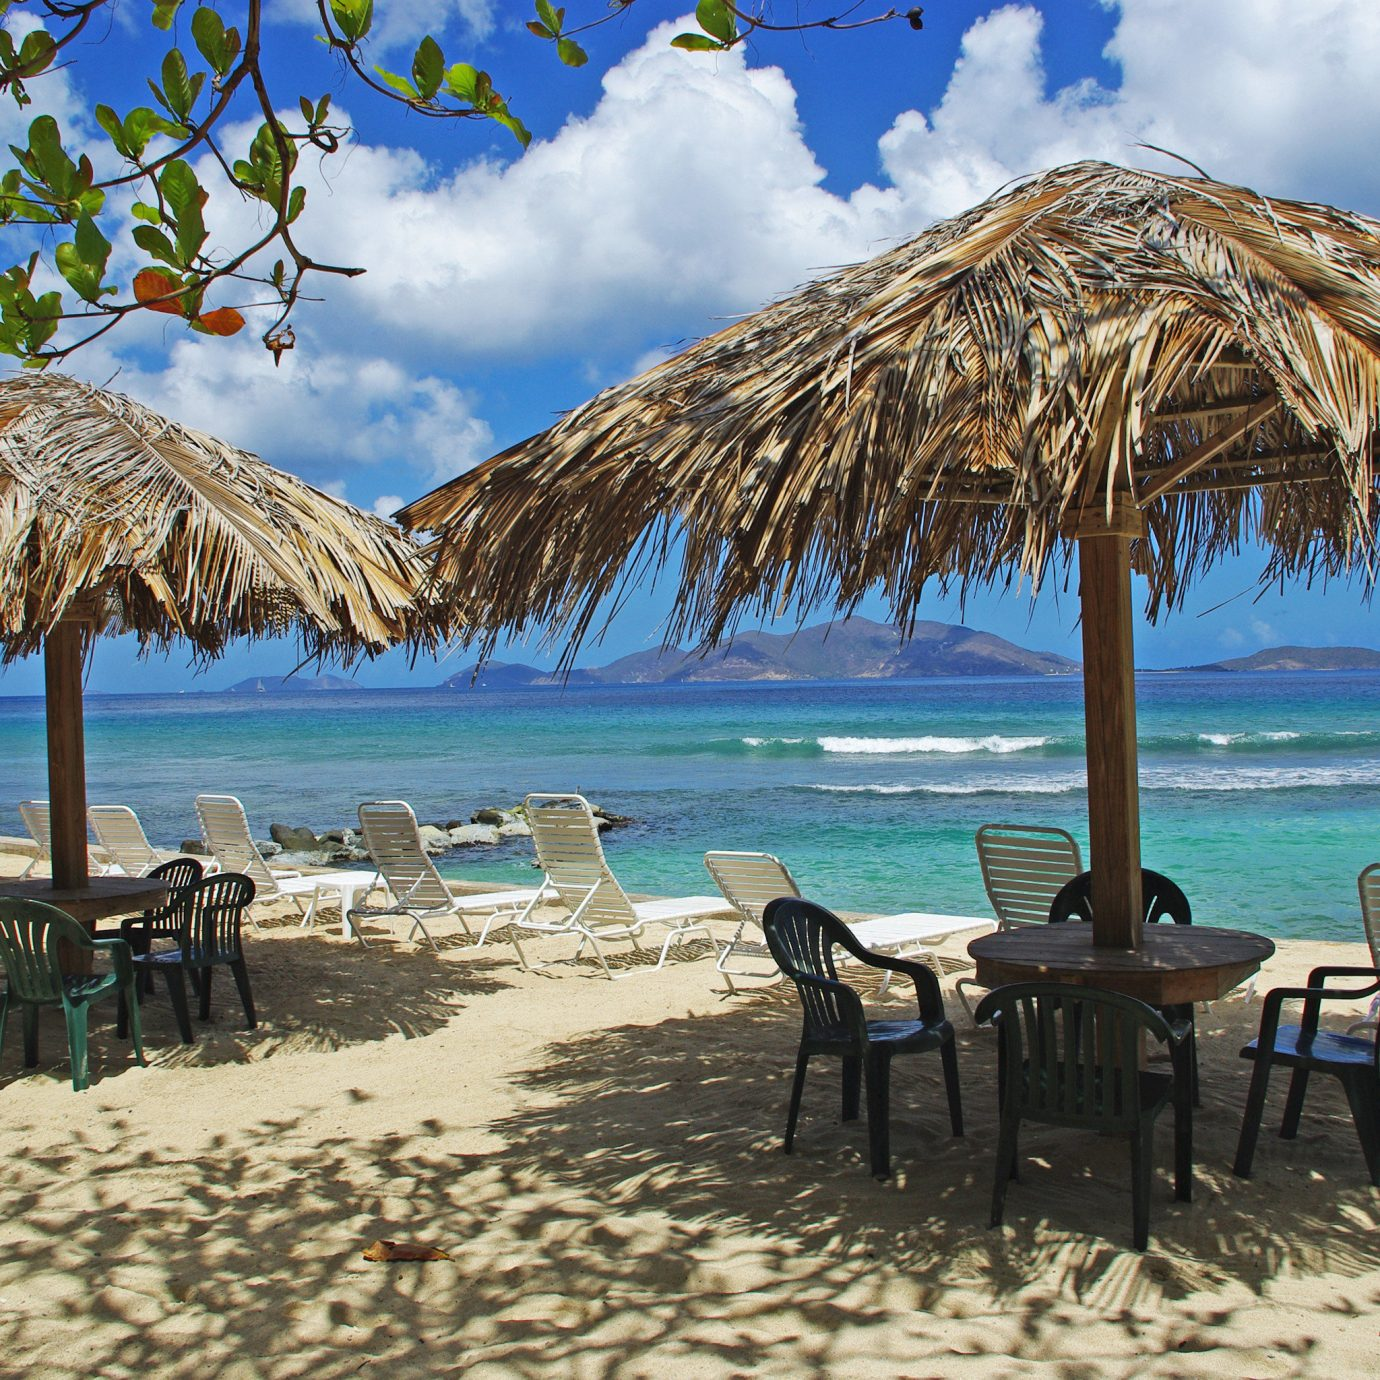 Beach Beachfront Grounds Luxury Ocean Resort umbrella chair water sky ground lawn Sea shore Nature Coast arecales caribbean sand cape Island lined Lagoon tropics set palm swimming day line sandy shade